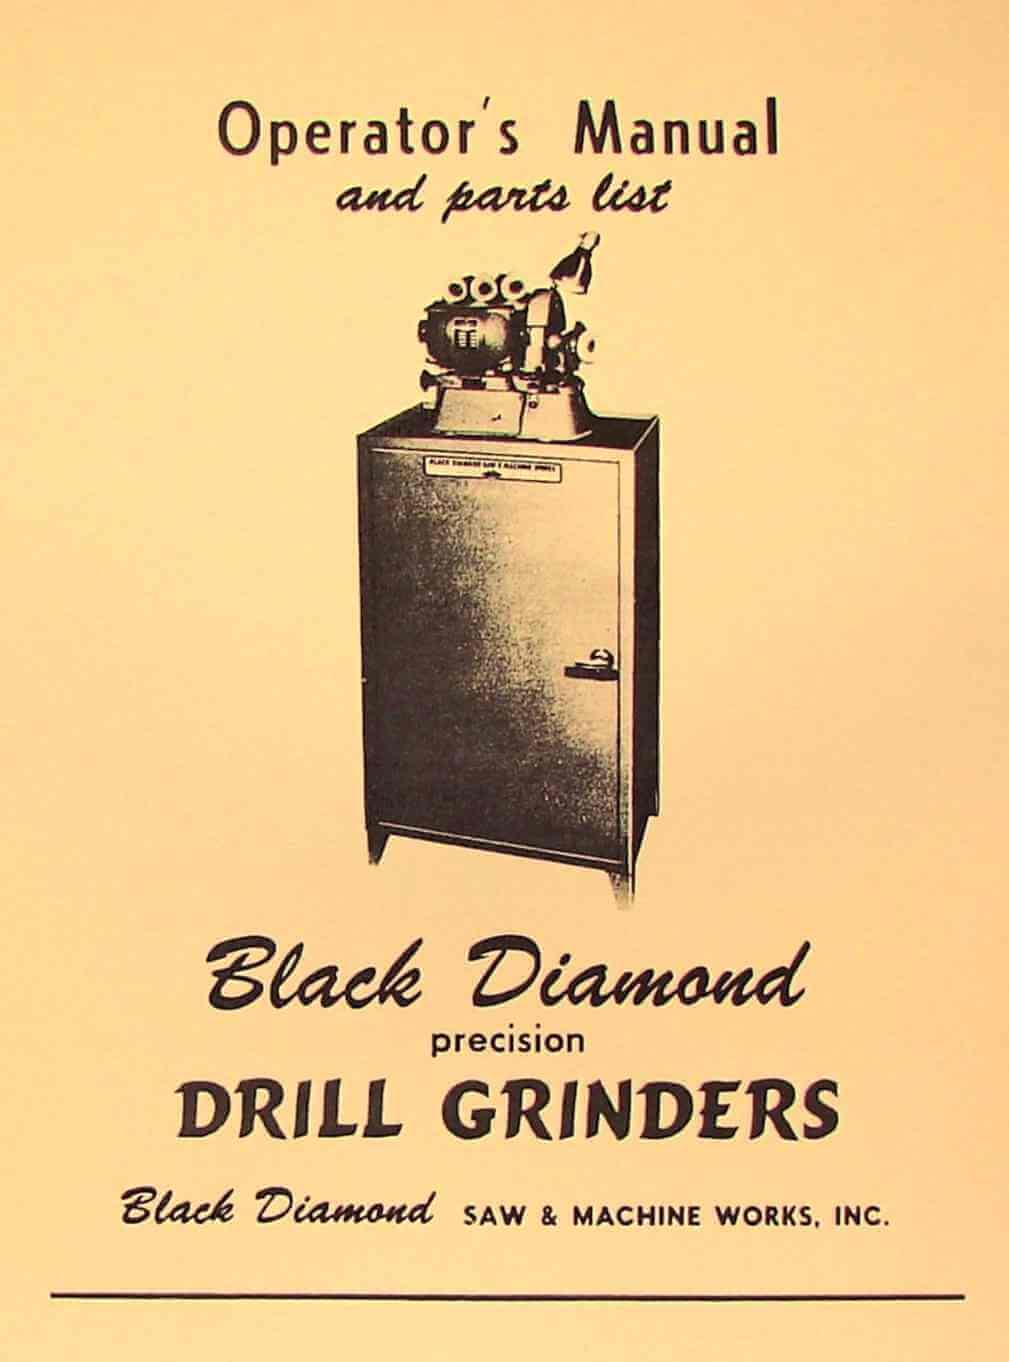 BLACK DIAMOND Drill Grinder No. 1,2,3 Instruction & Parts Manual | Ozark Tool Manuals & Books